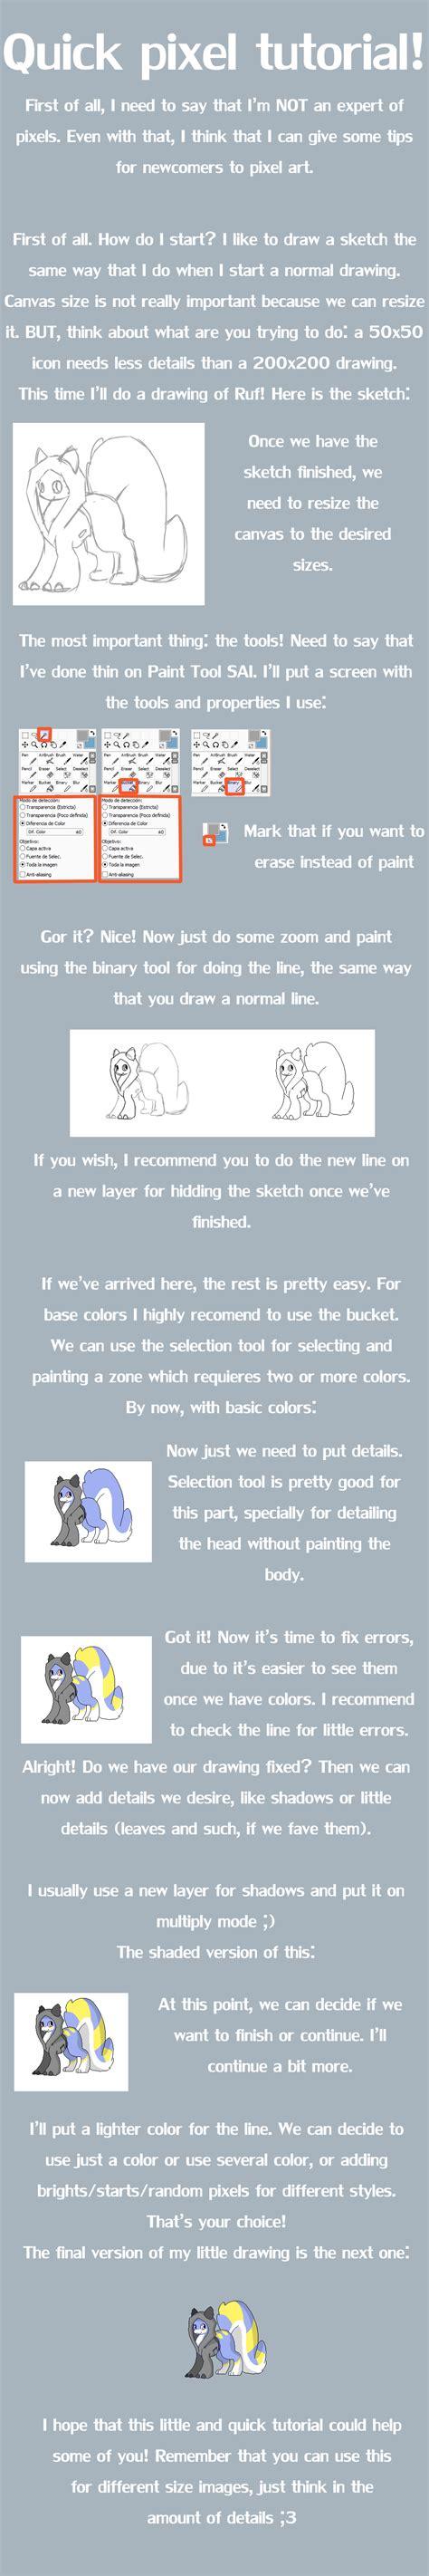 paint tool sai pixel tutorial pixel tutorial paint tool sai by ayinai on deviantart